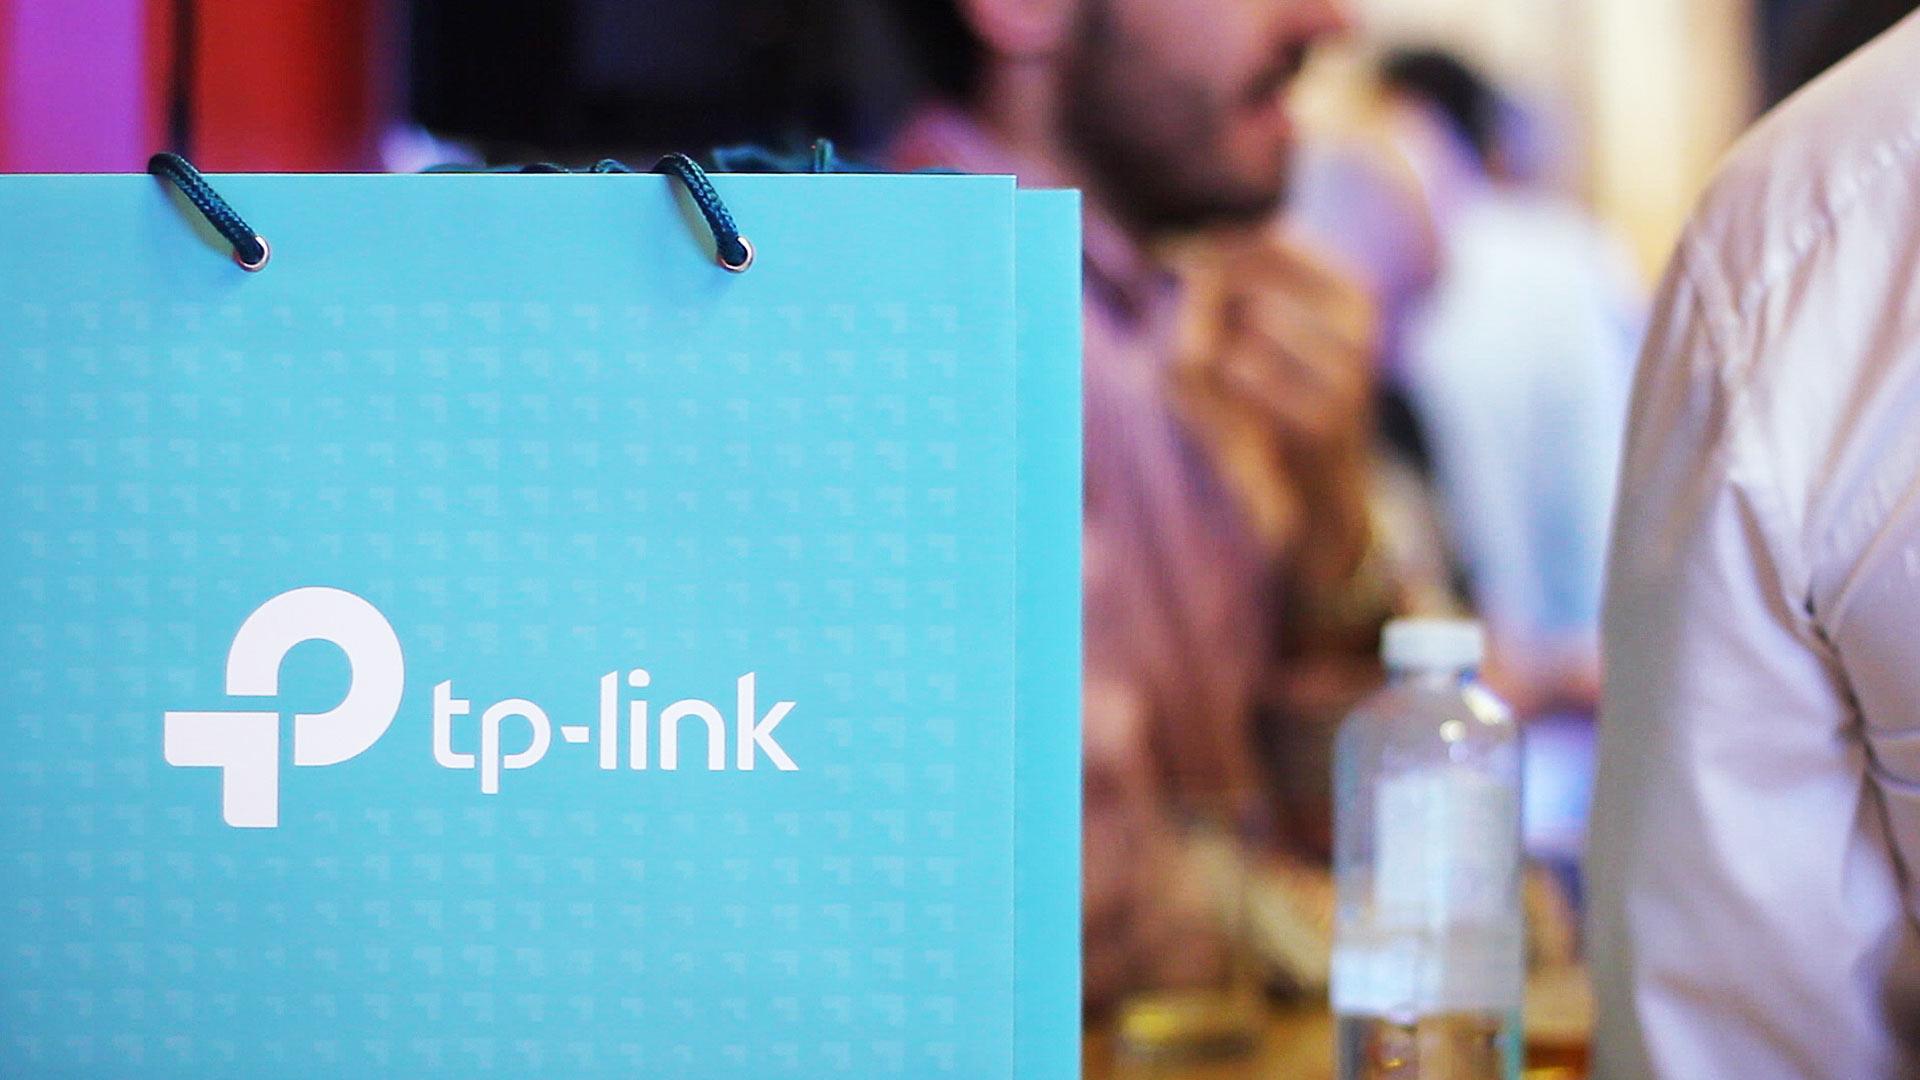 tplink-evento-partner-cocktail-comunicacion-canal-20